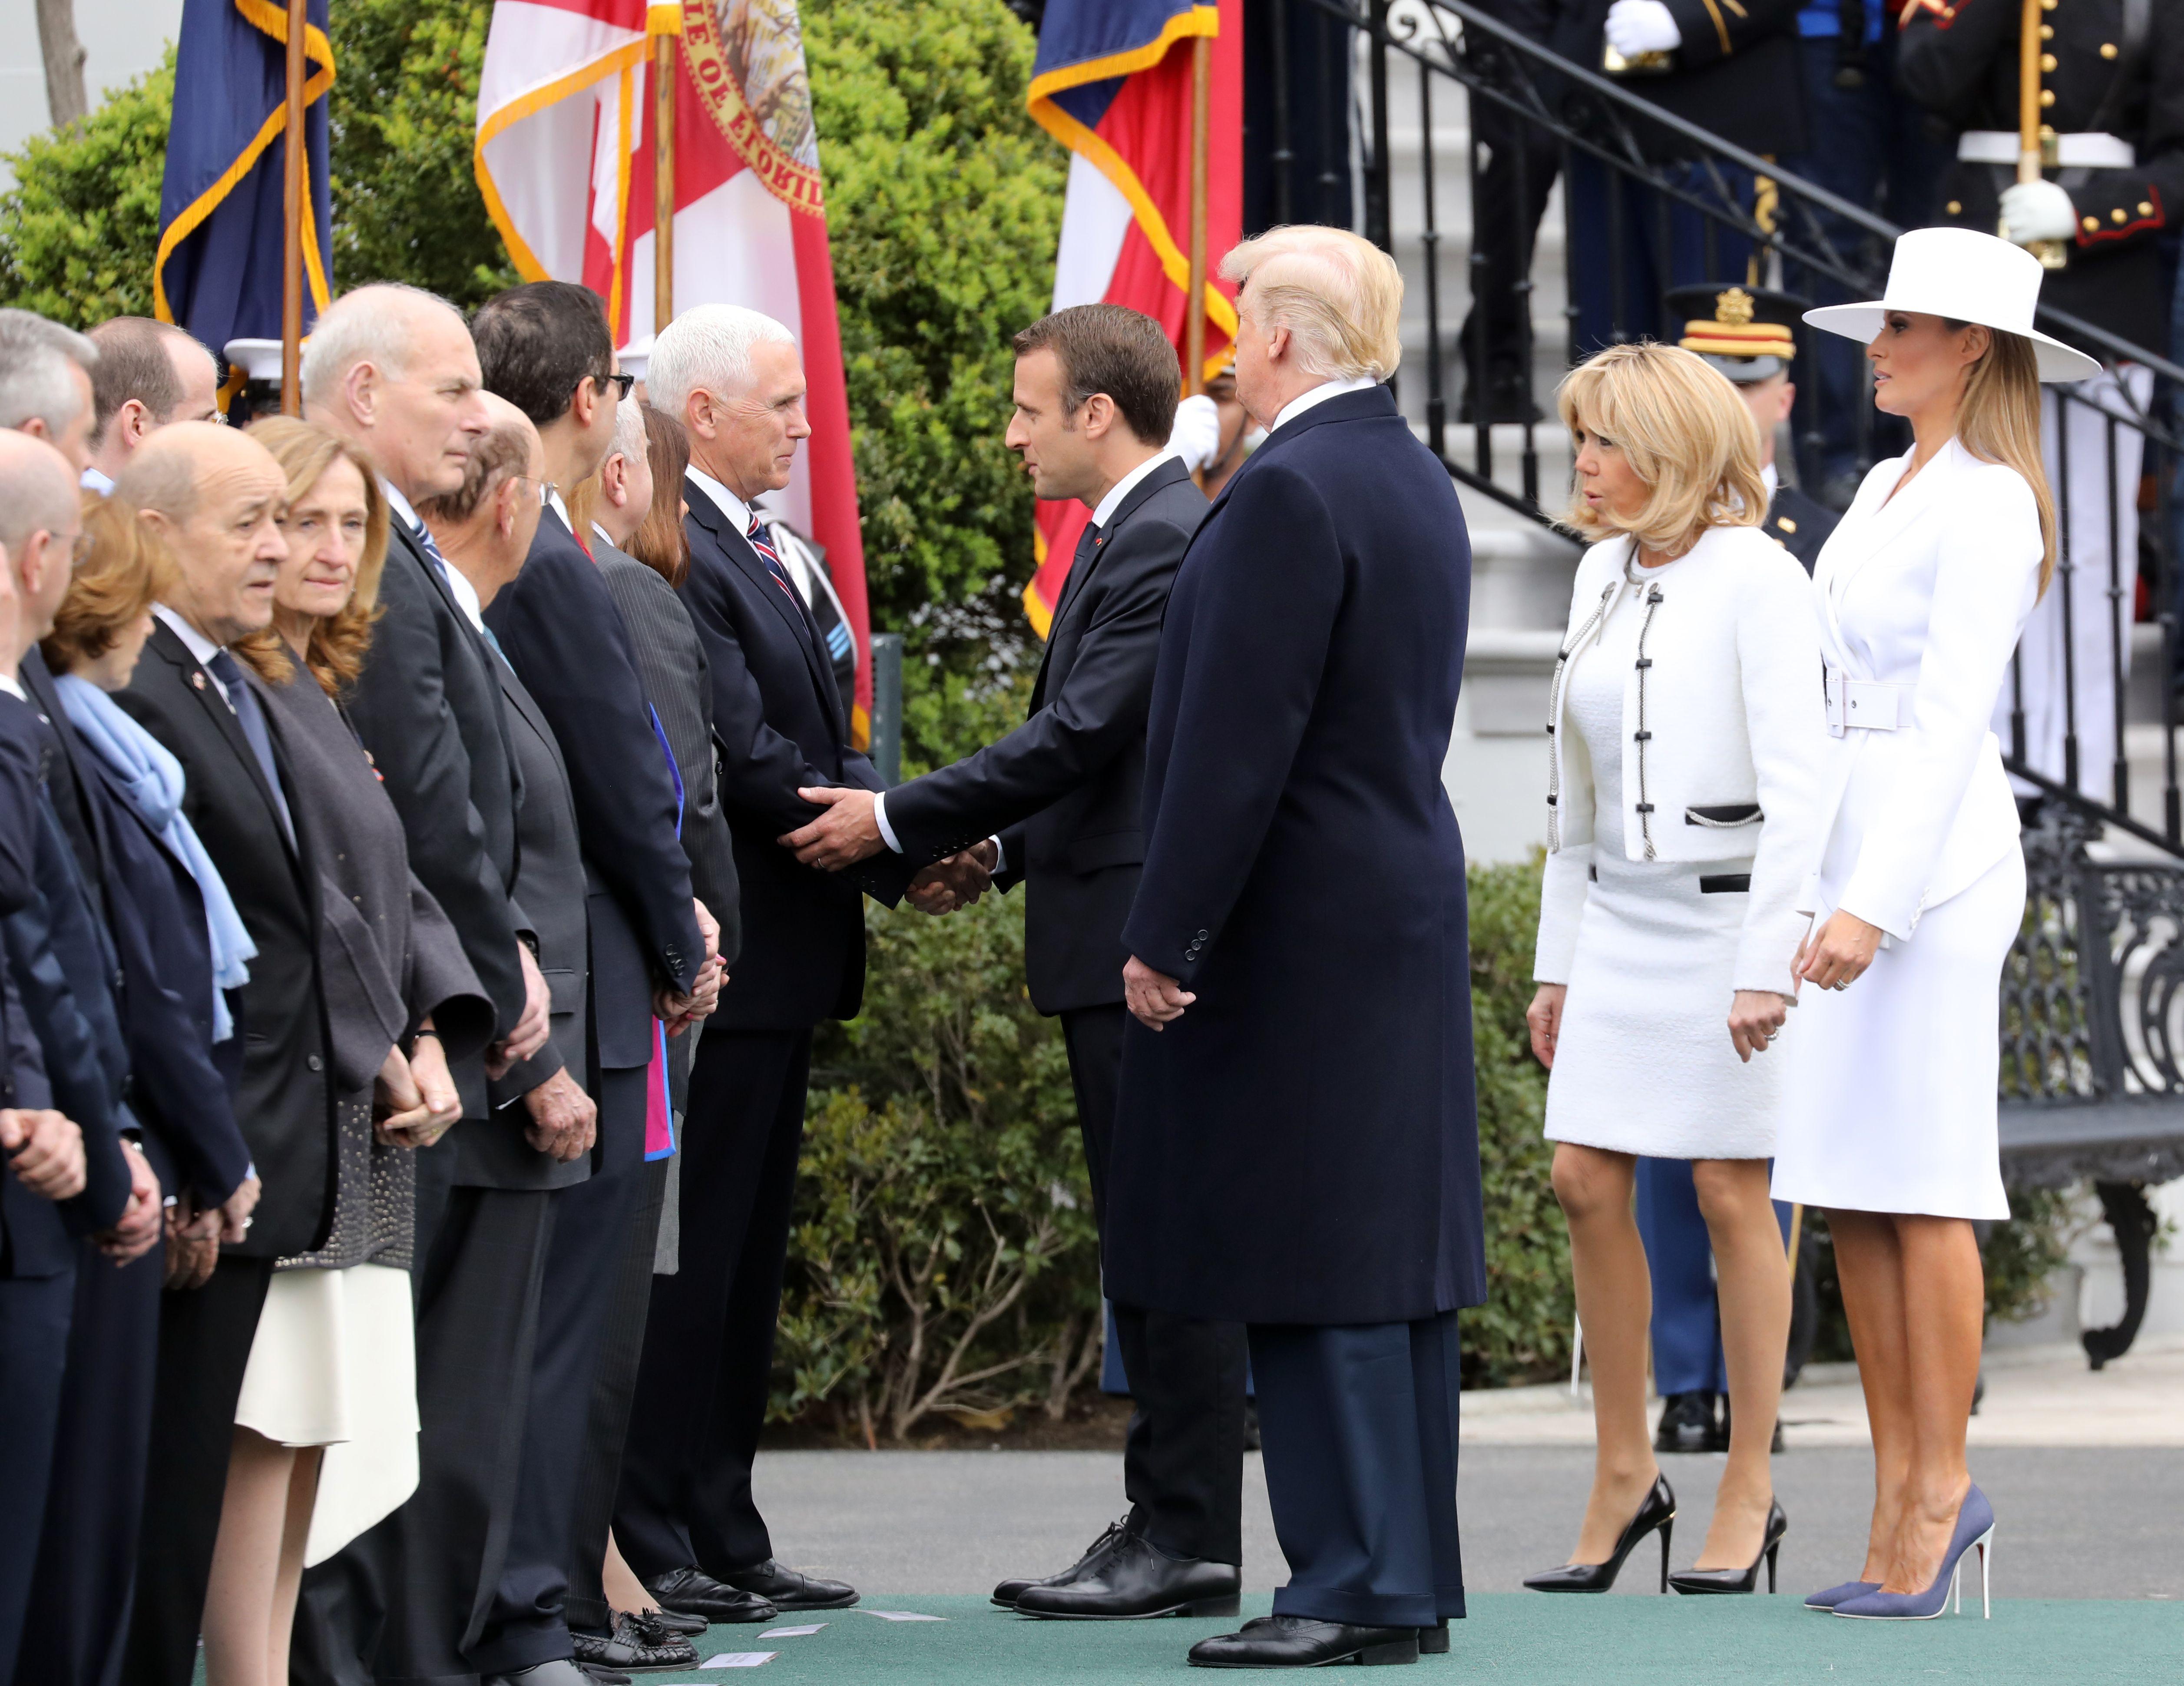 Emmanuel Macron and Vice President Mike Pence